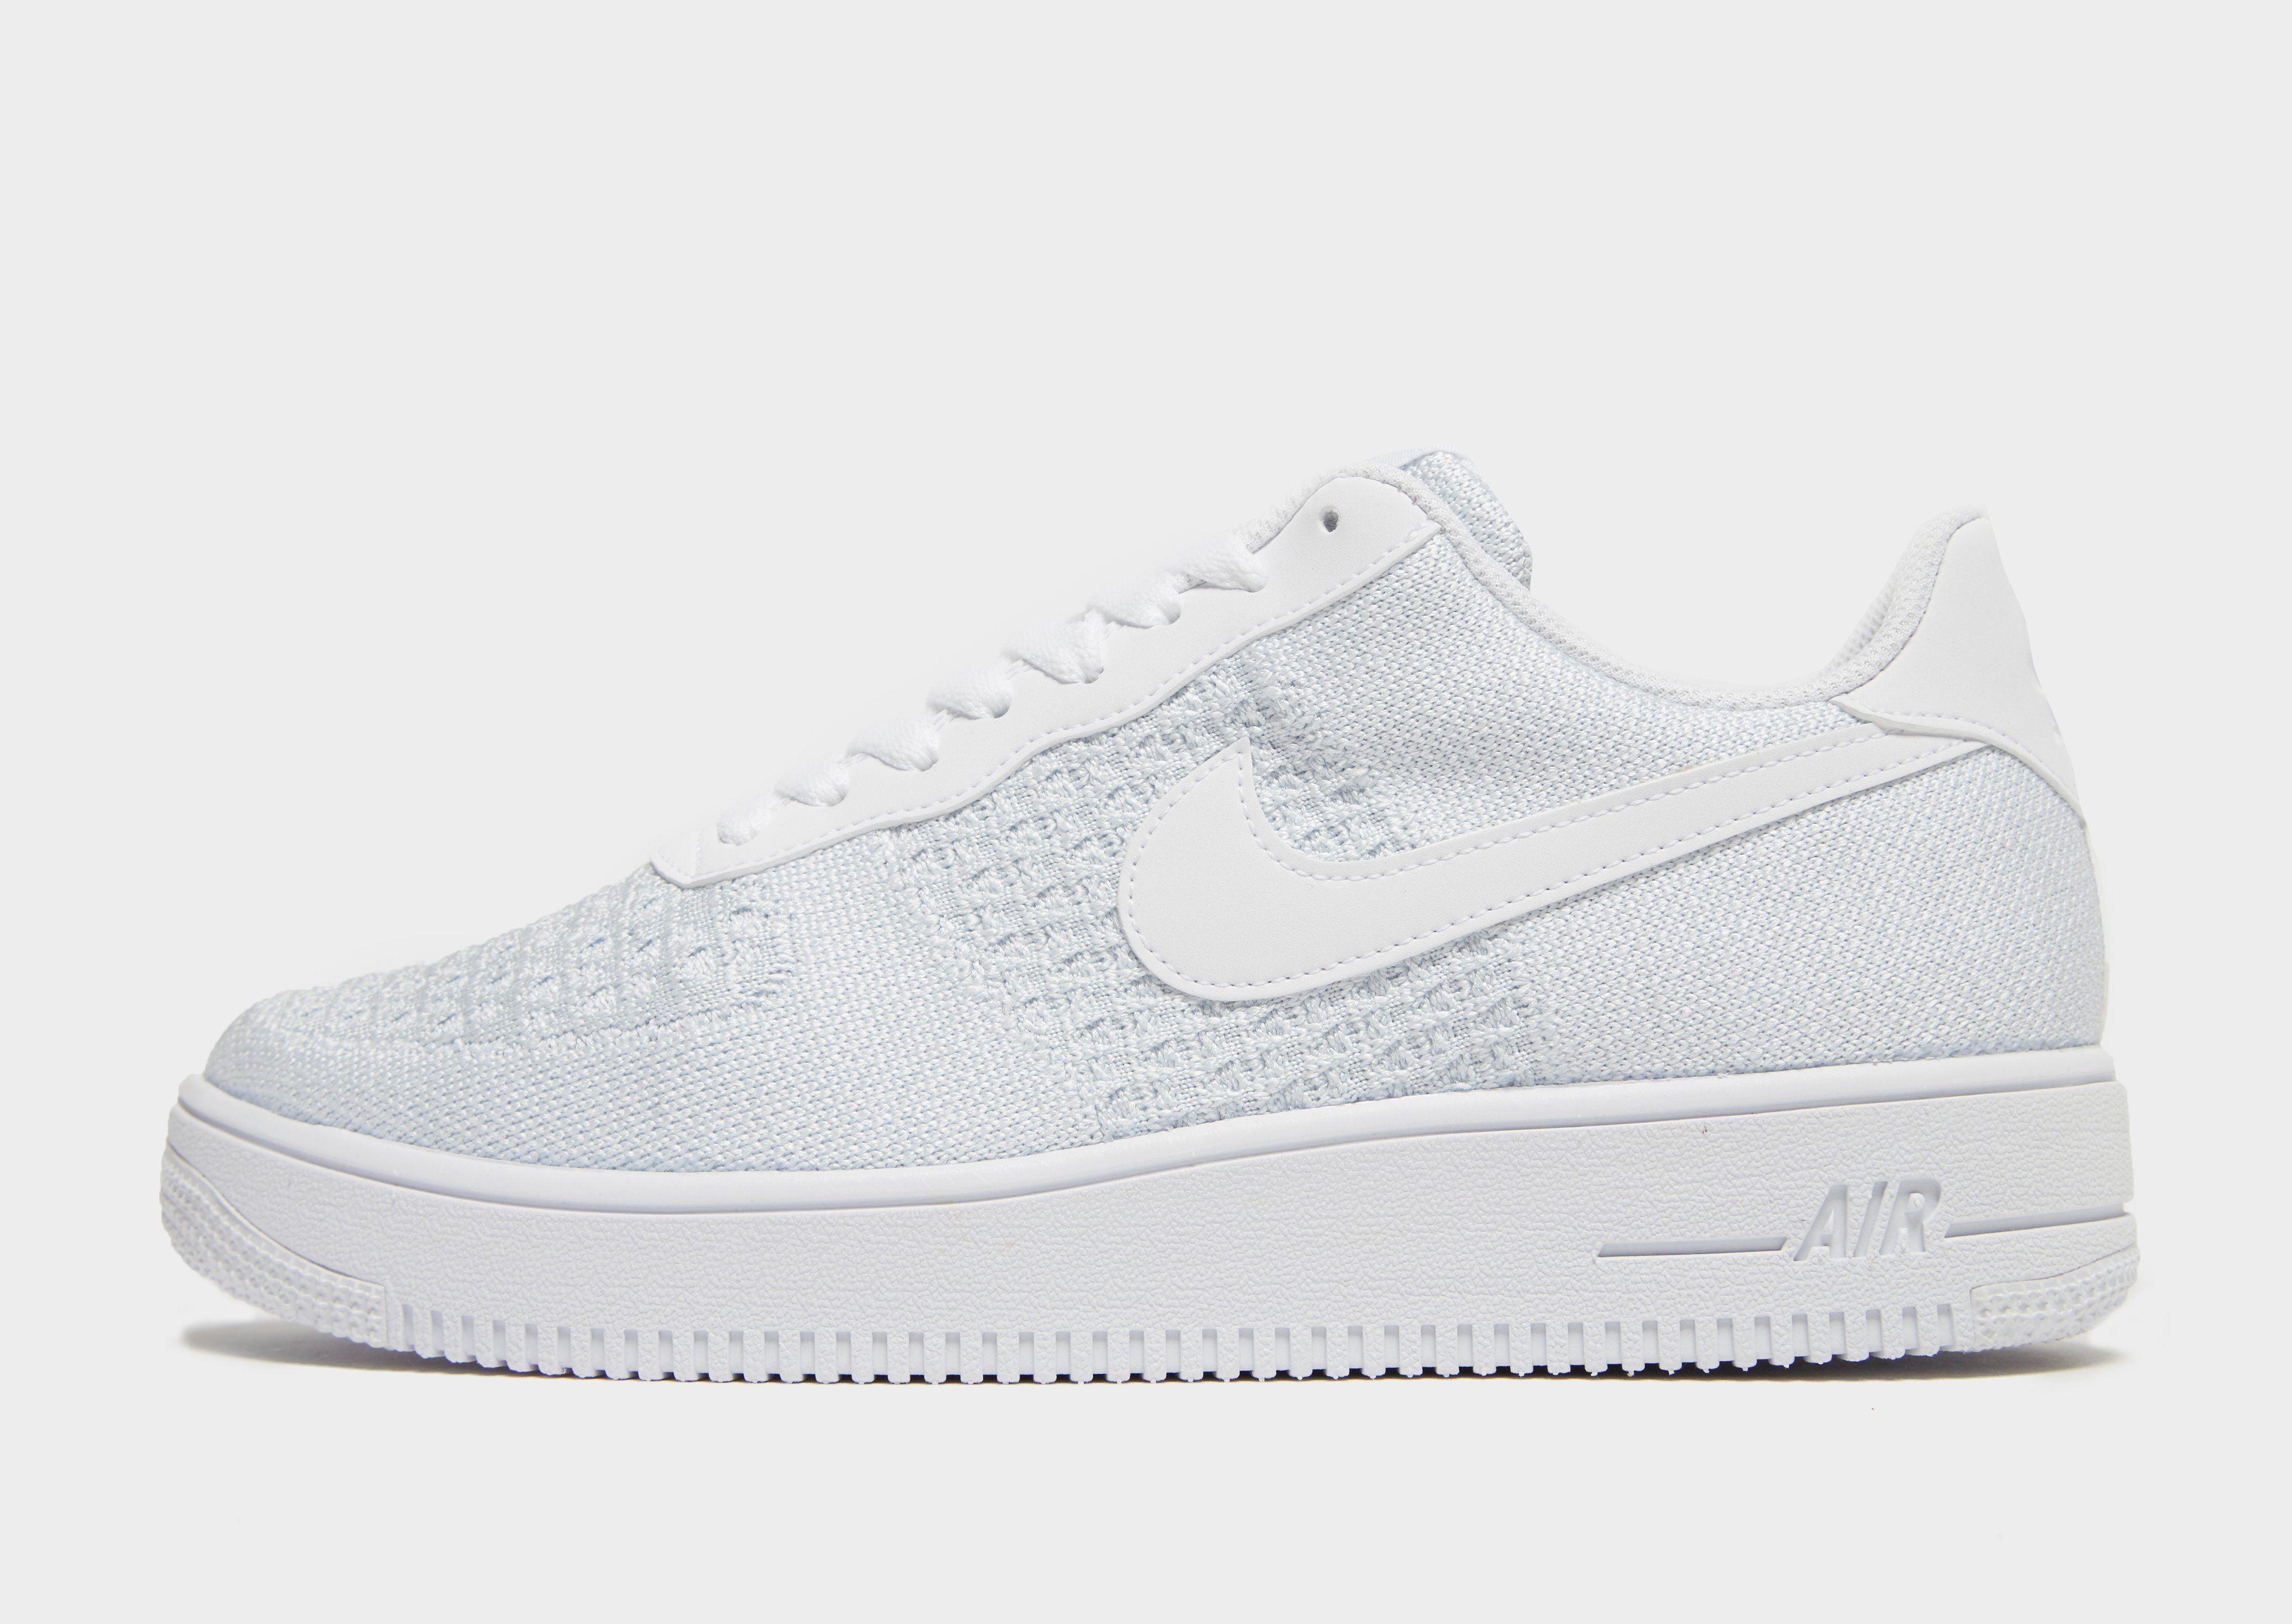 check out a4a8e 17121 Nike Nike Air Force 1 Flyknit 2.0 Men's Shoe | JD Sports